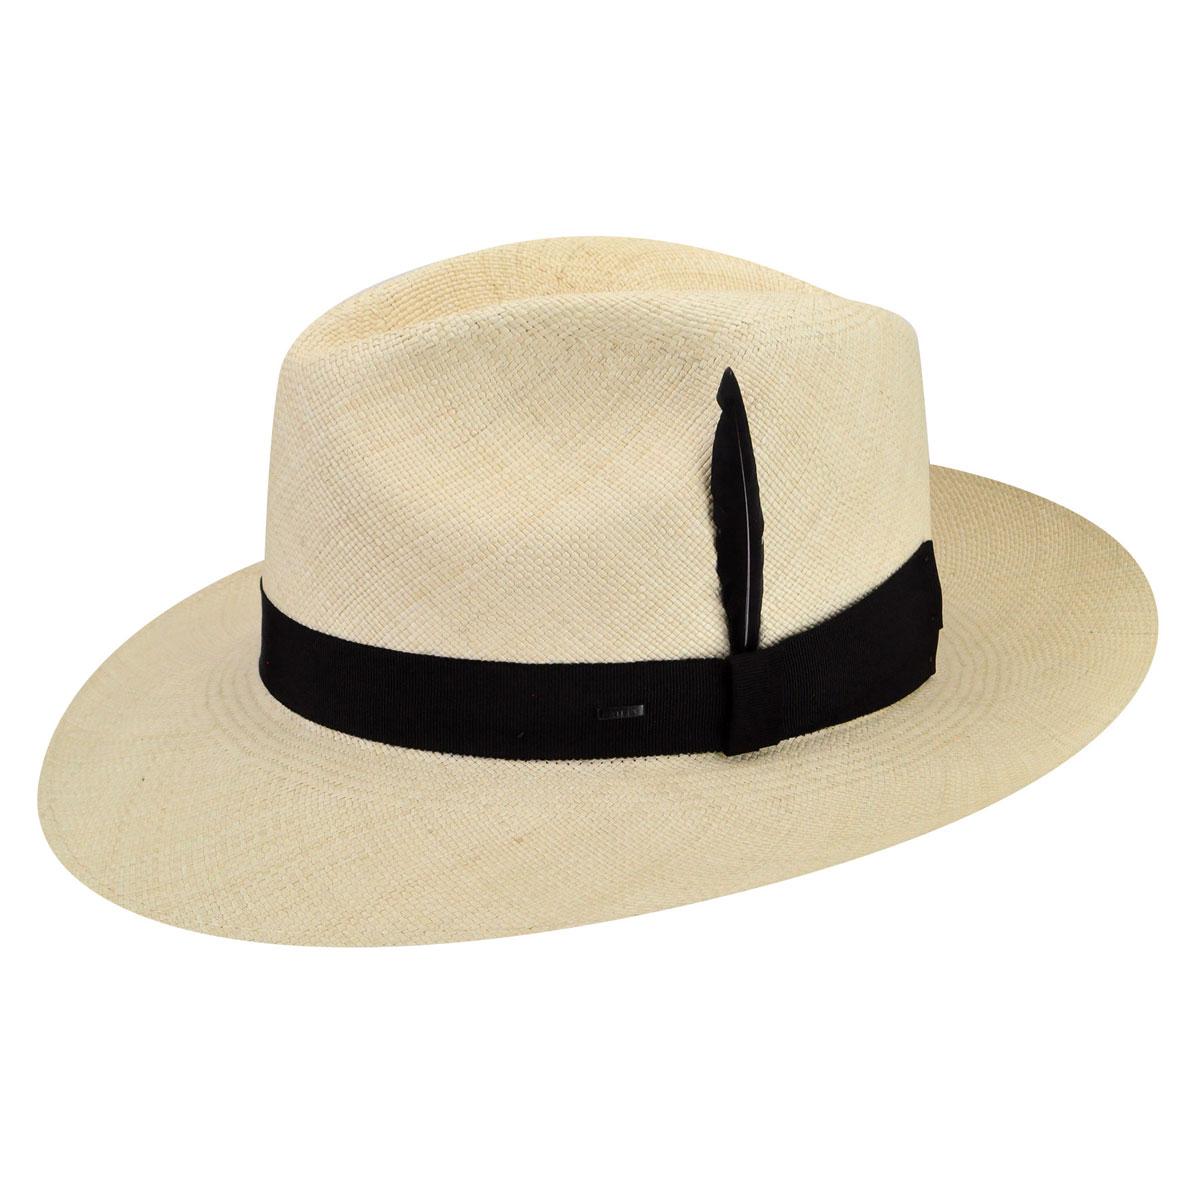 1940s Mens Hat Styles and History Loring Panama Fedora $275.00 AT vintagedancer.com